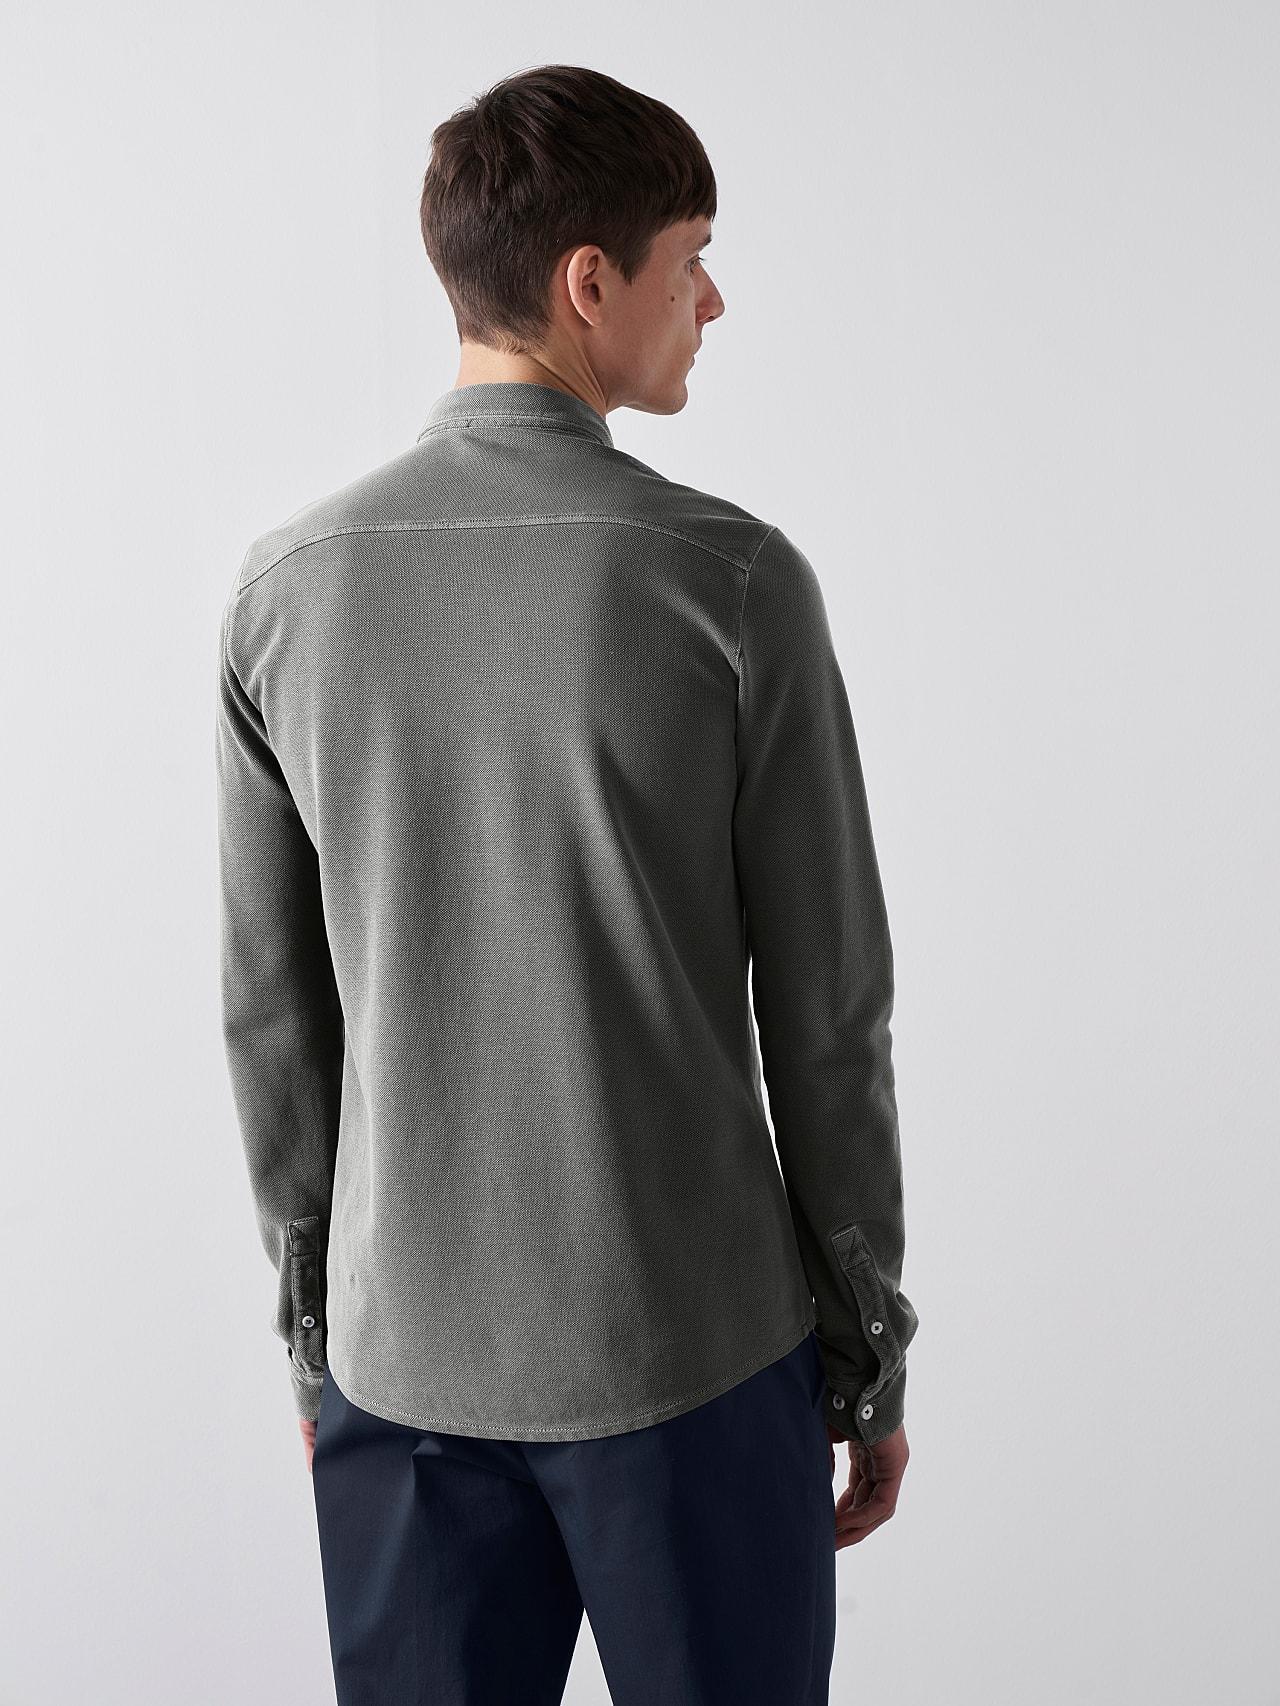 JIQUE V1.Y5.01 Pique Shirt with Kent Collar dark grey / anthracite Front Main Alpha Tauri